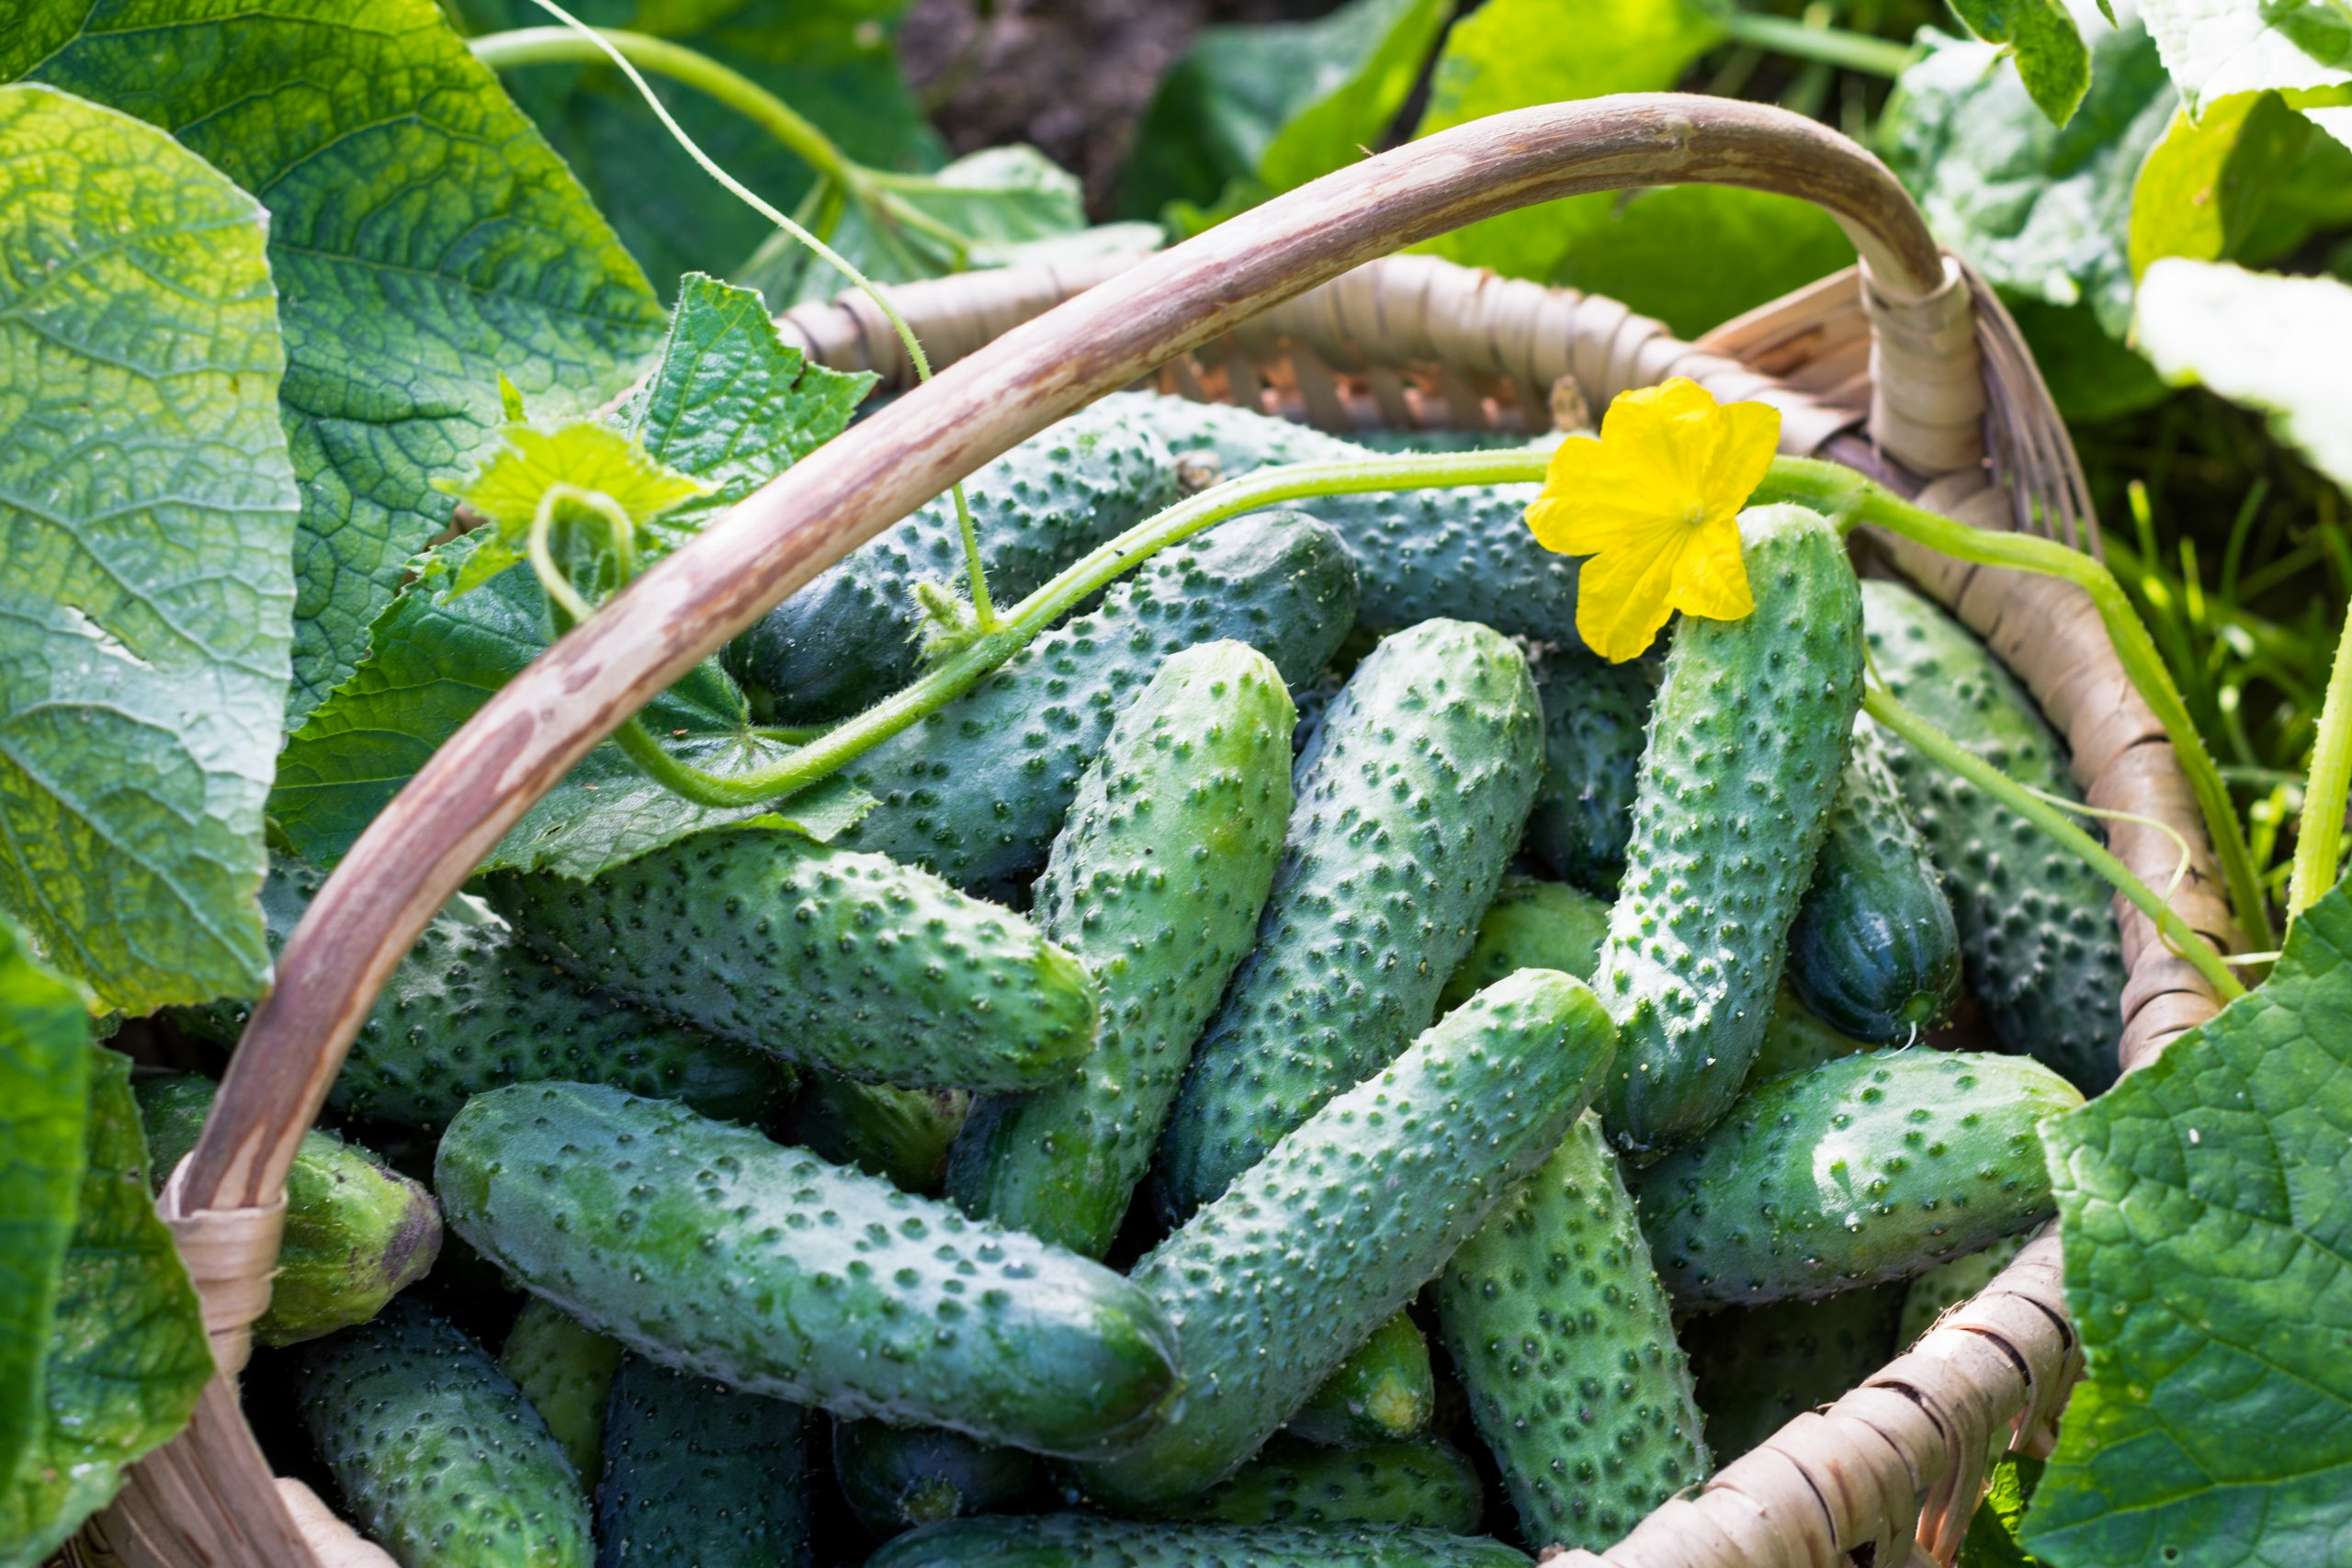 Cucumbers Types — 15 Popular Cultivars